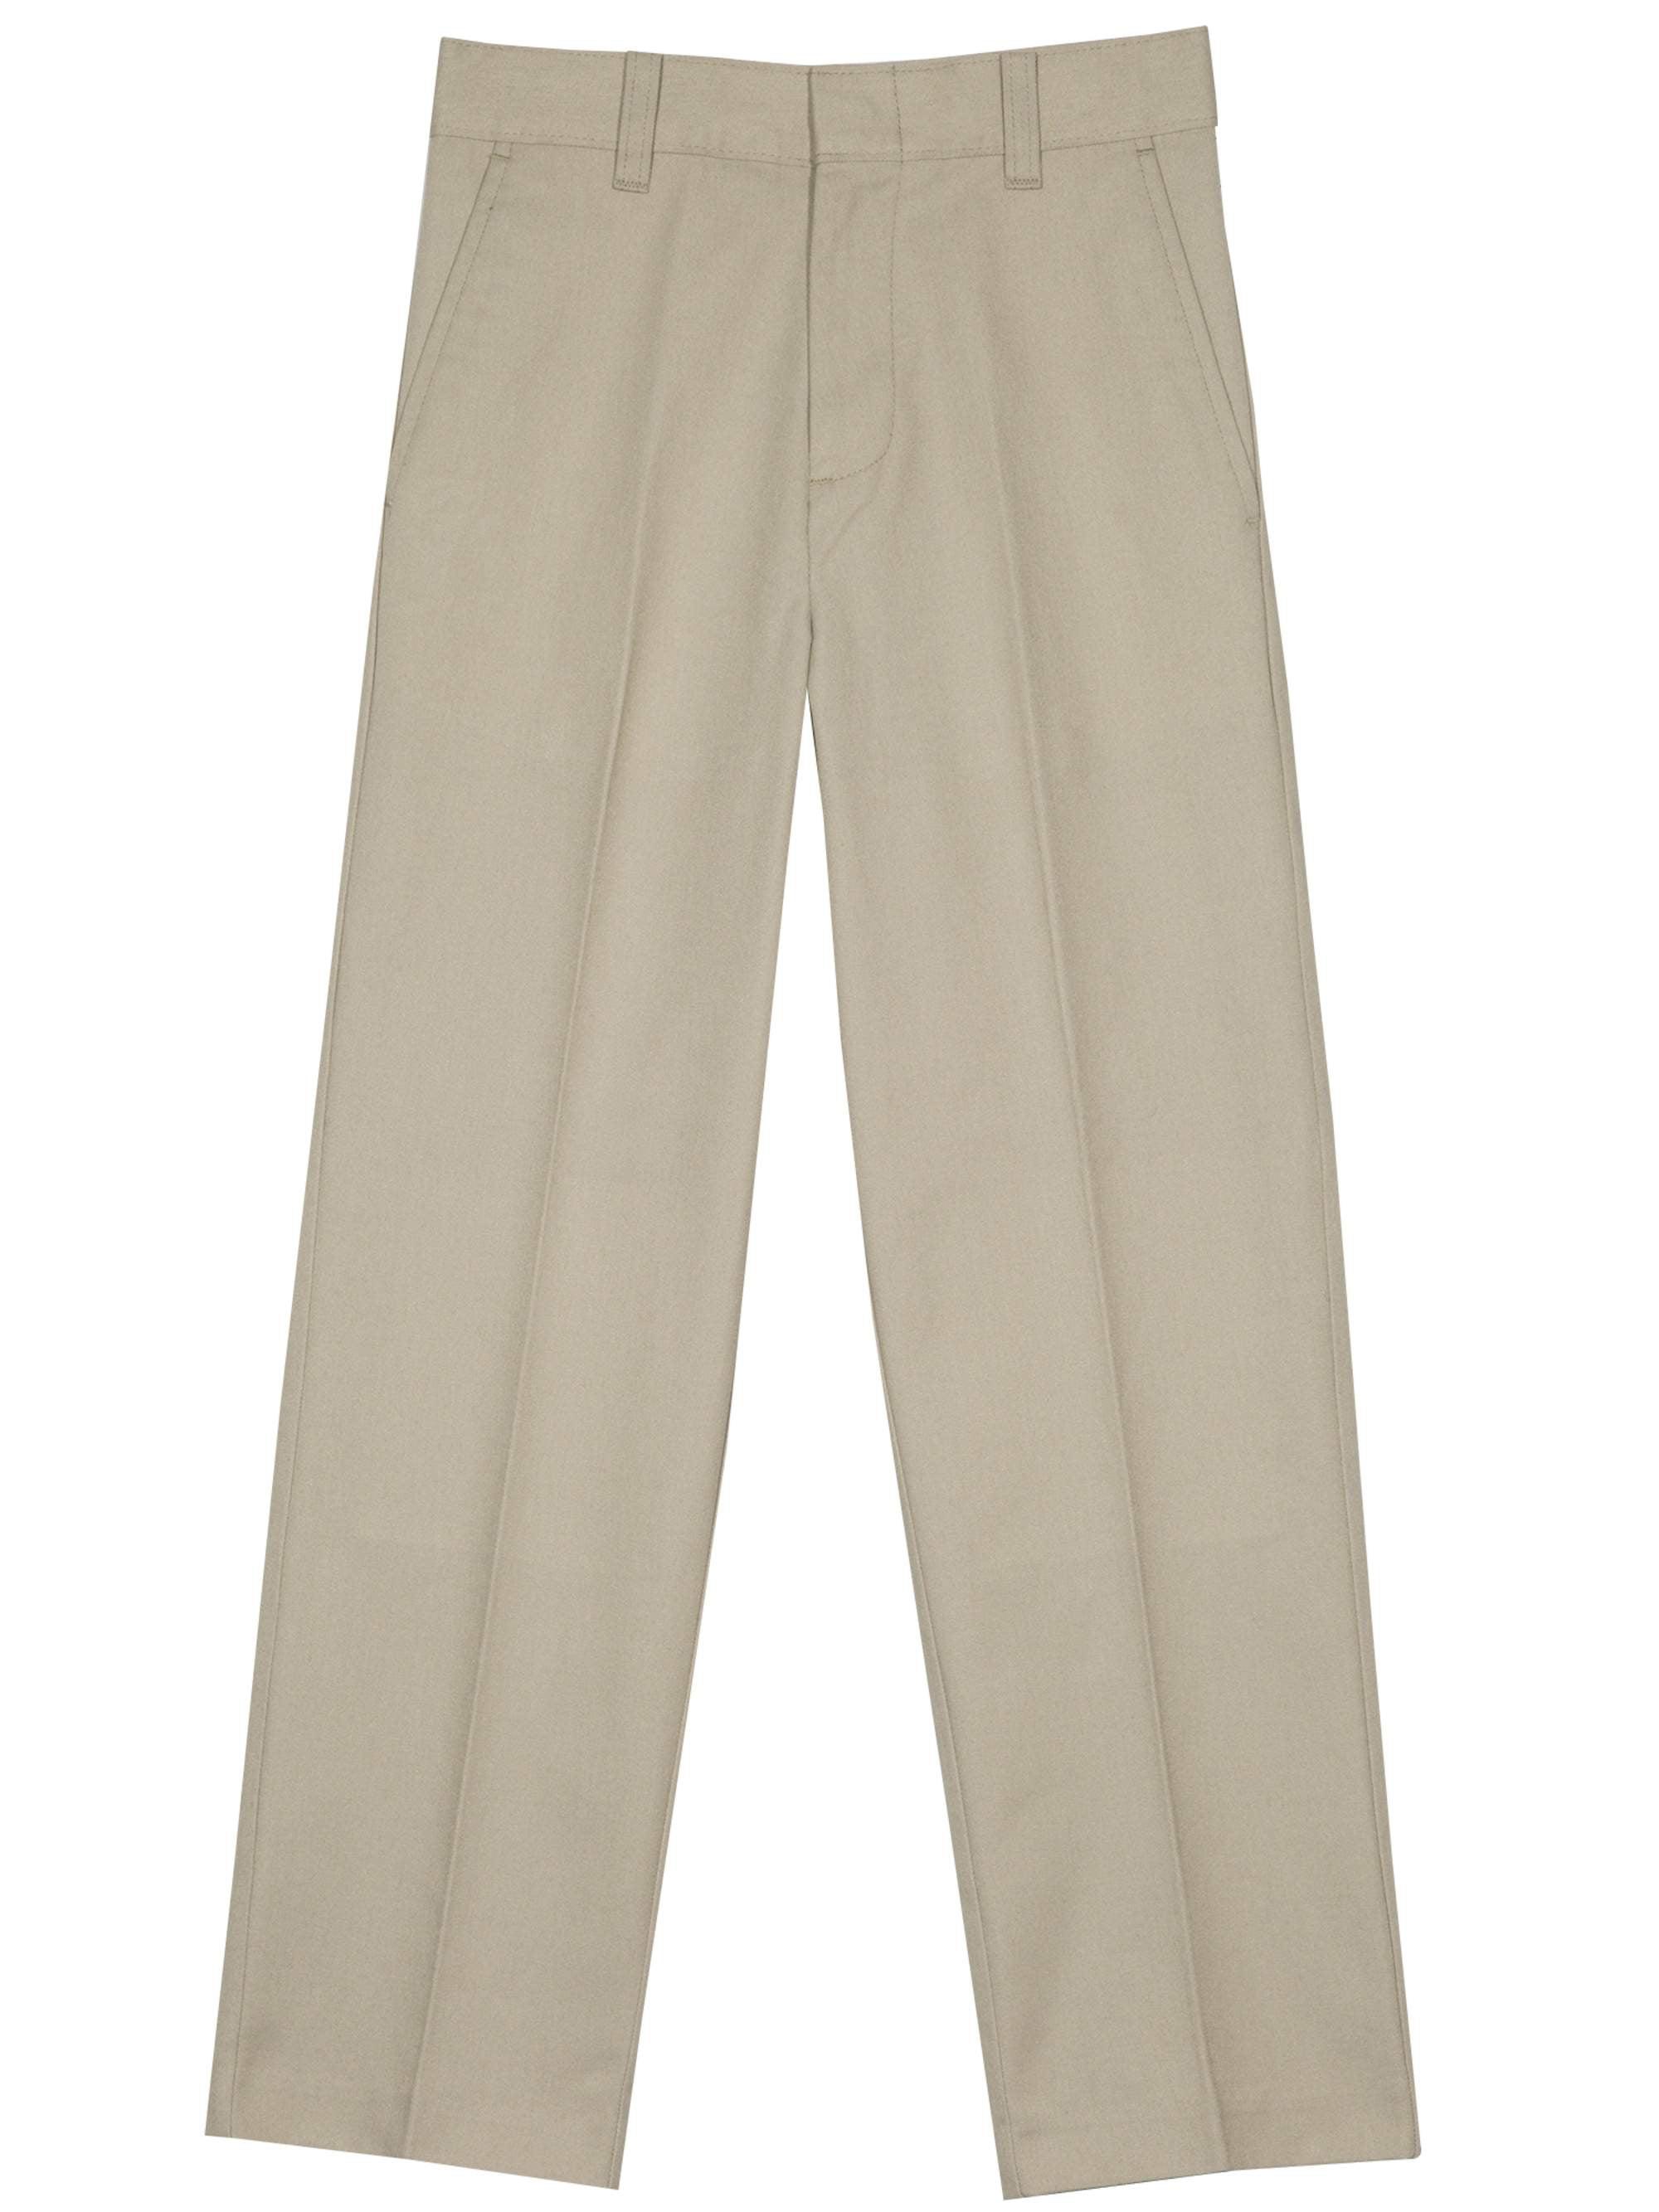 Boys' Flat Front Slim Pant